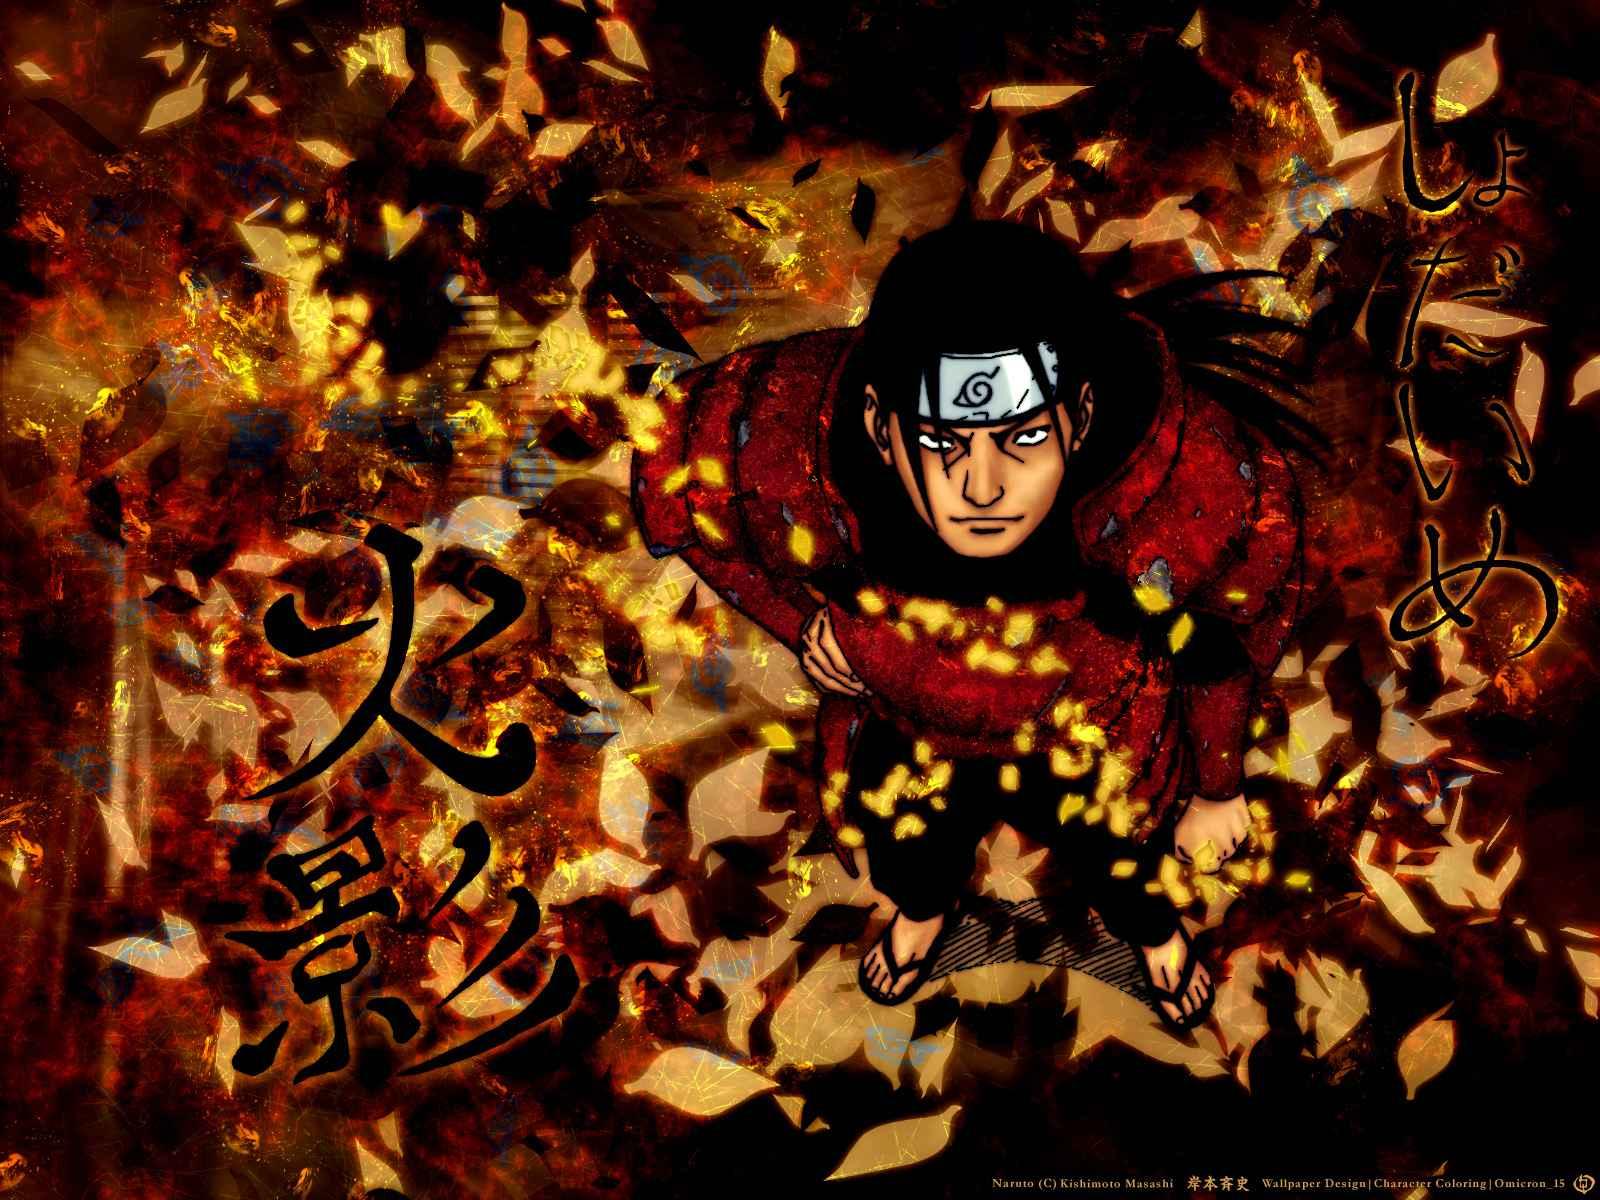 Naruto Shippuden Wallpapers 2016 - Wallpaper Cave